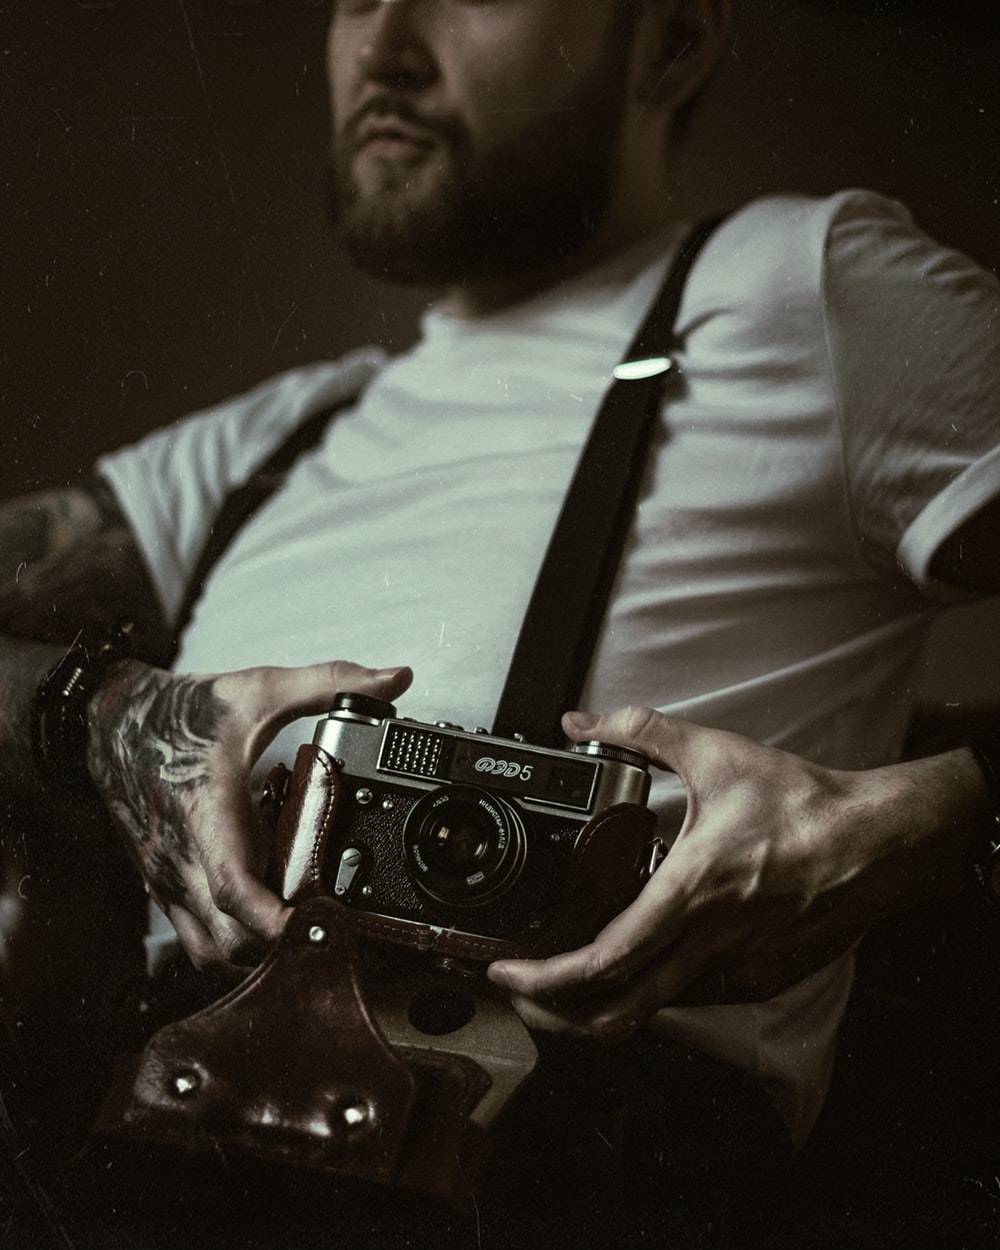 man in white crew-neck top holding black DSLR camera